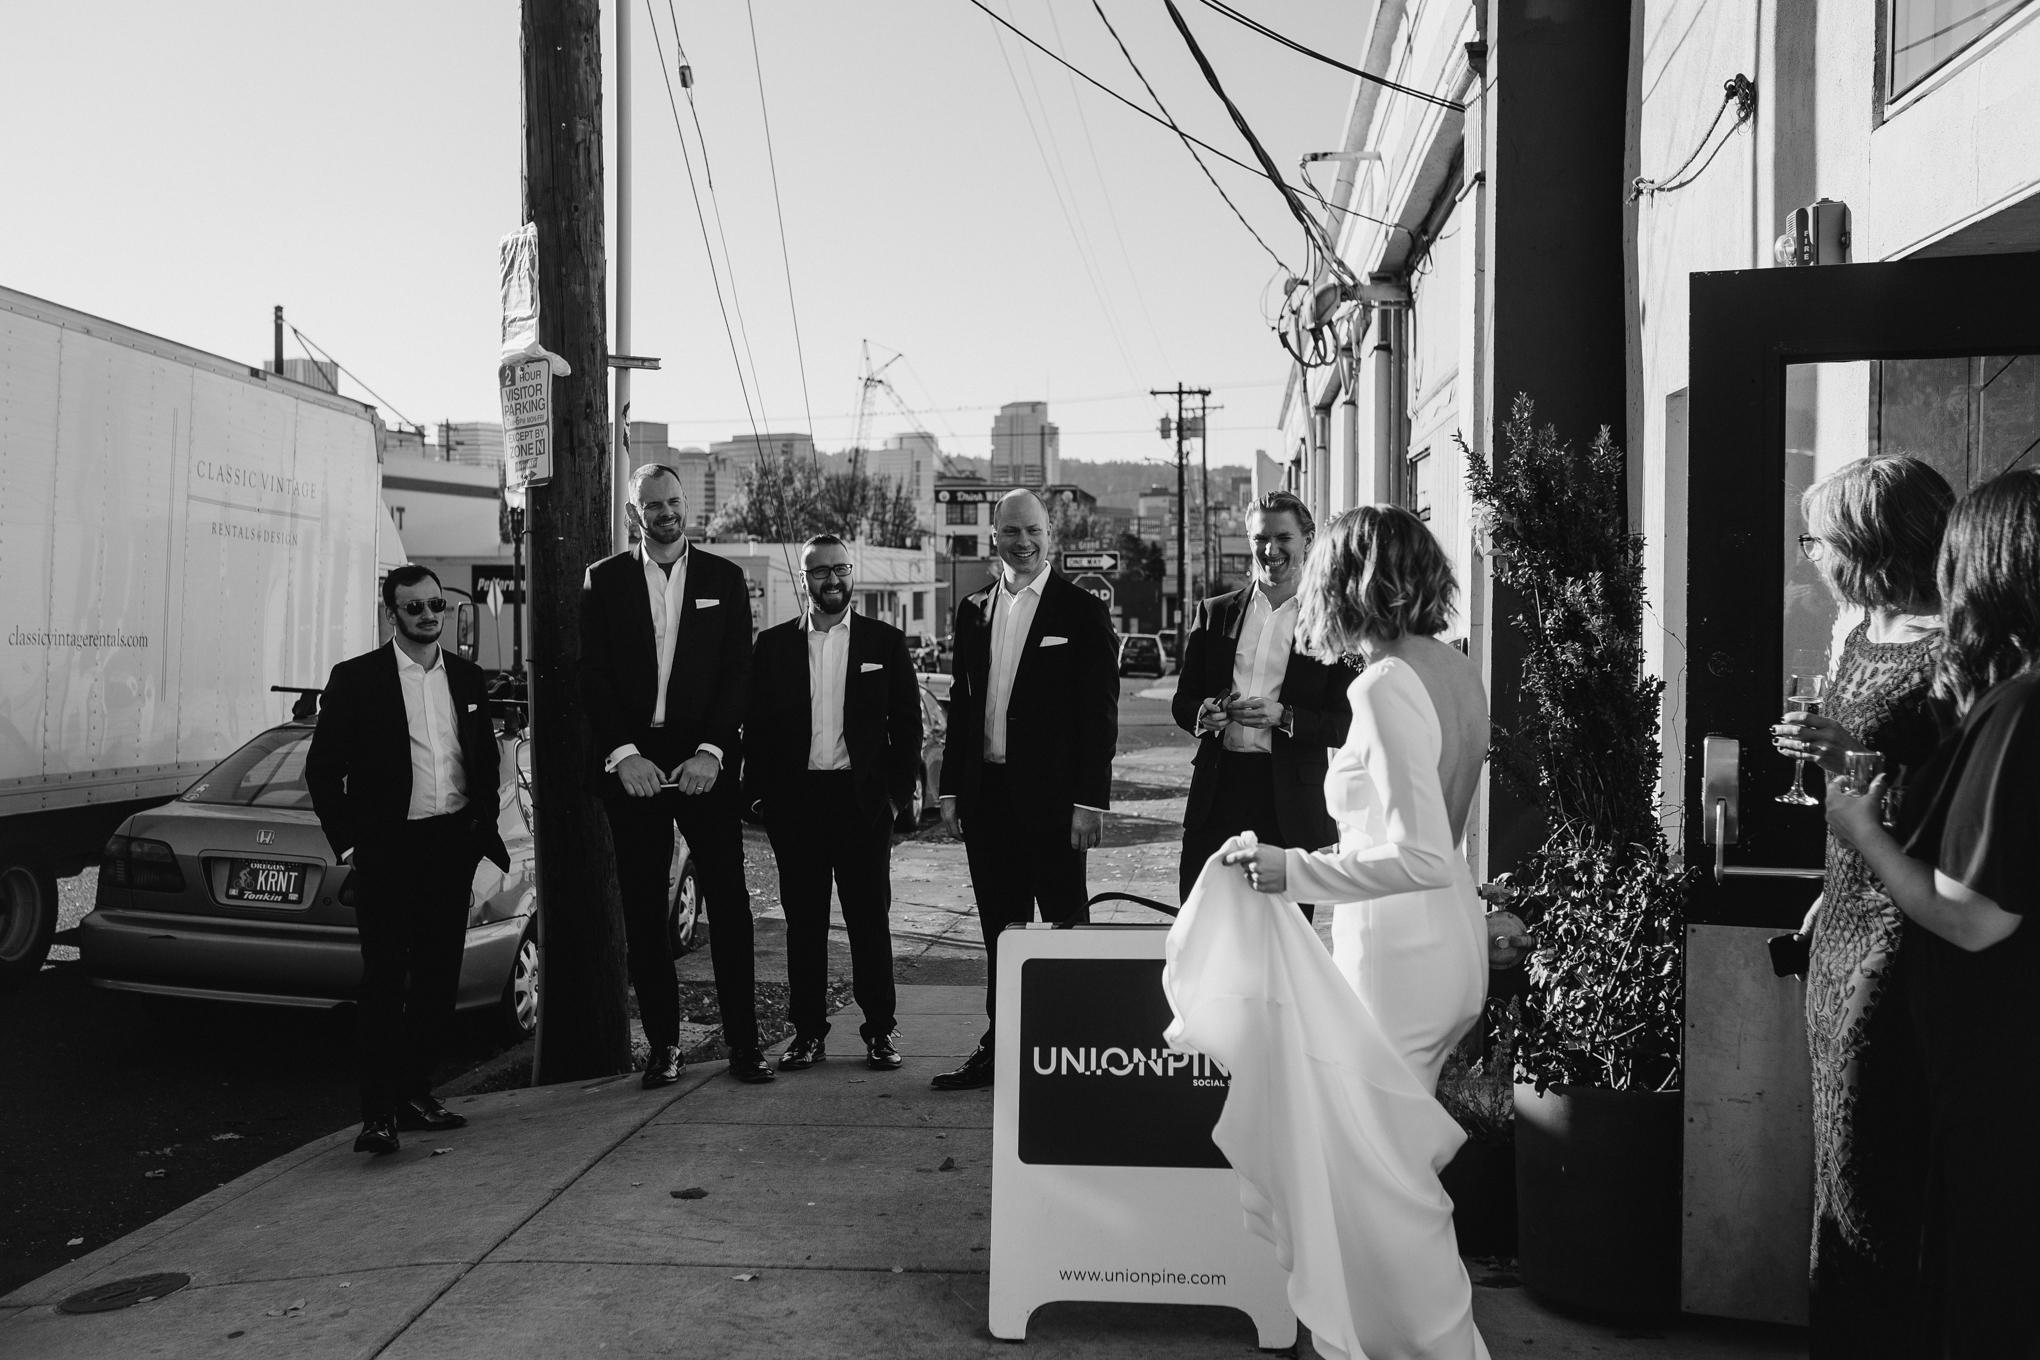 union-pine-urban-portland-trendy-wedding-62.jpg